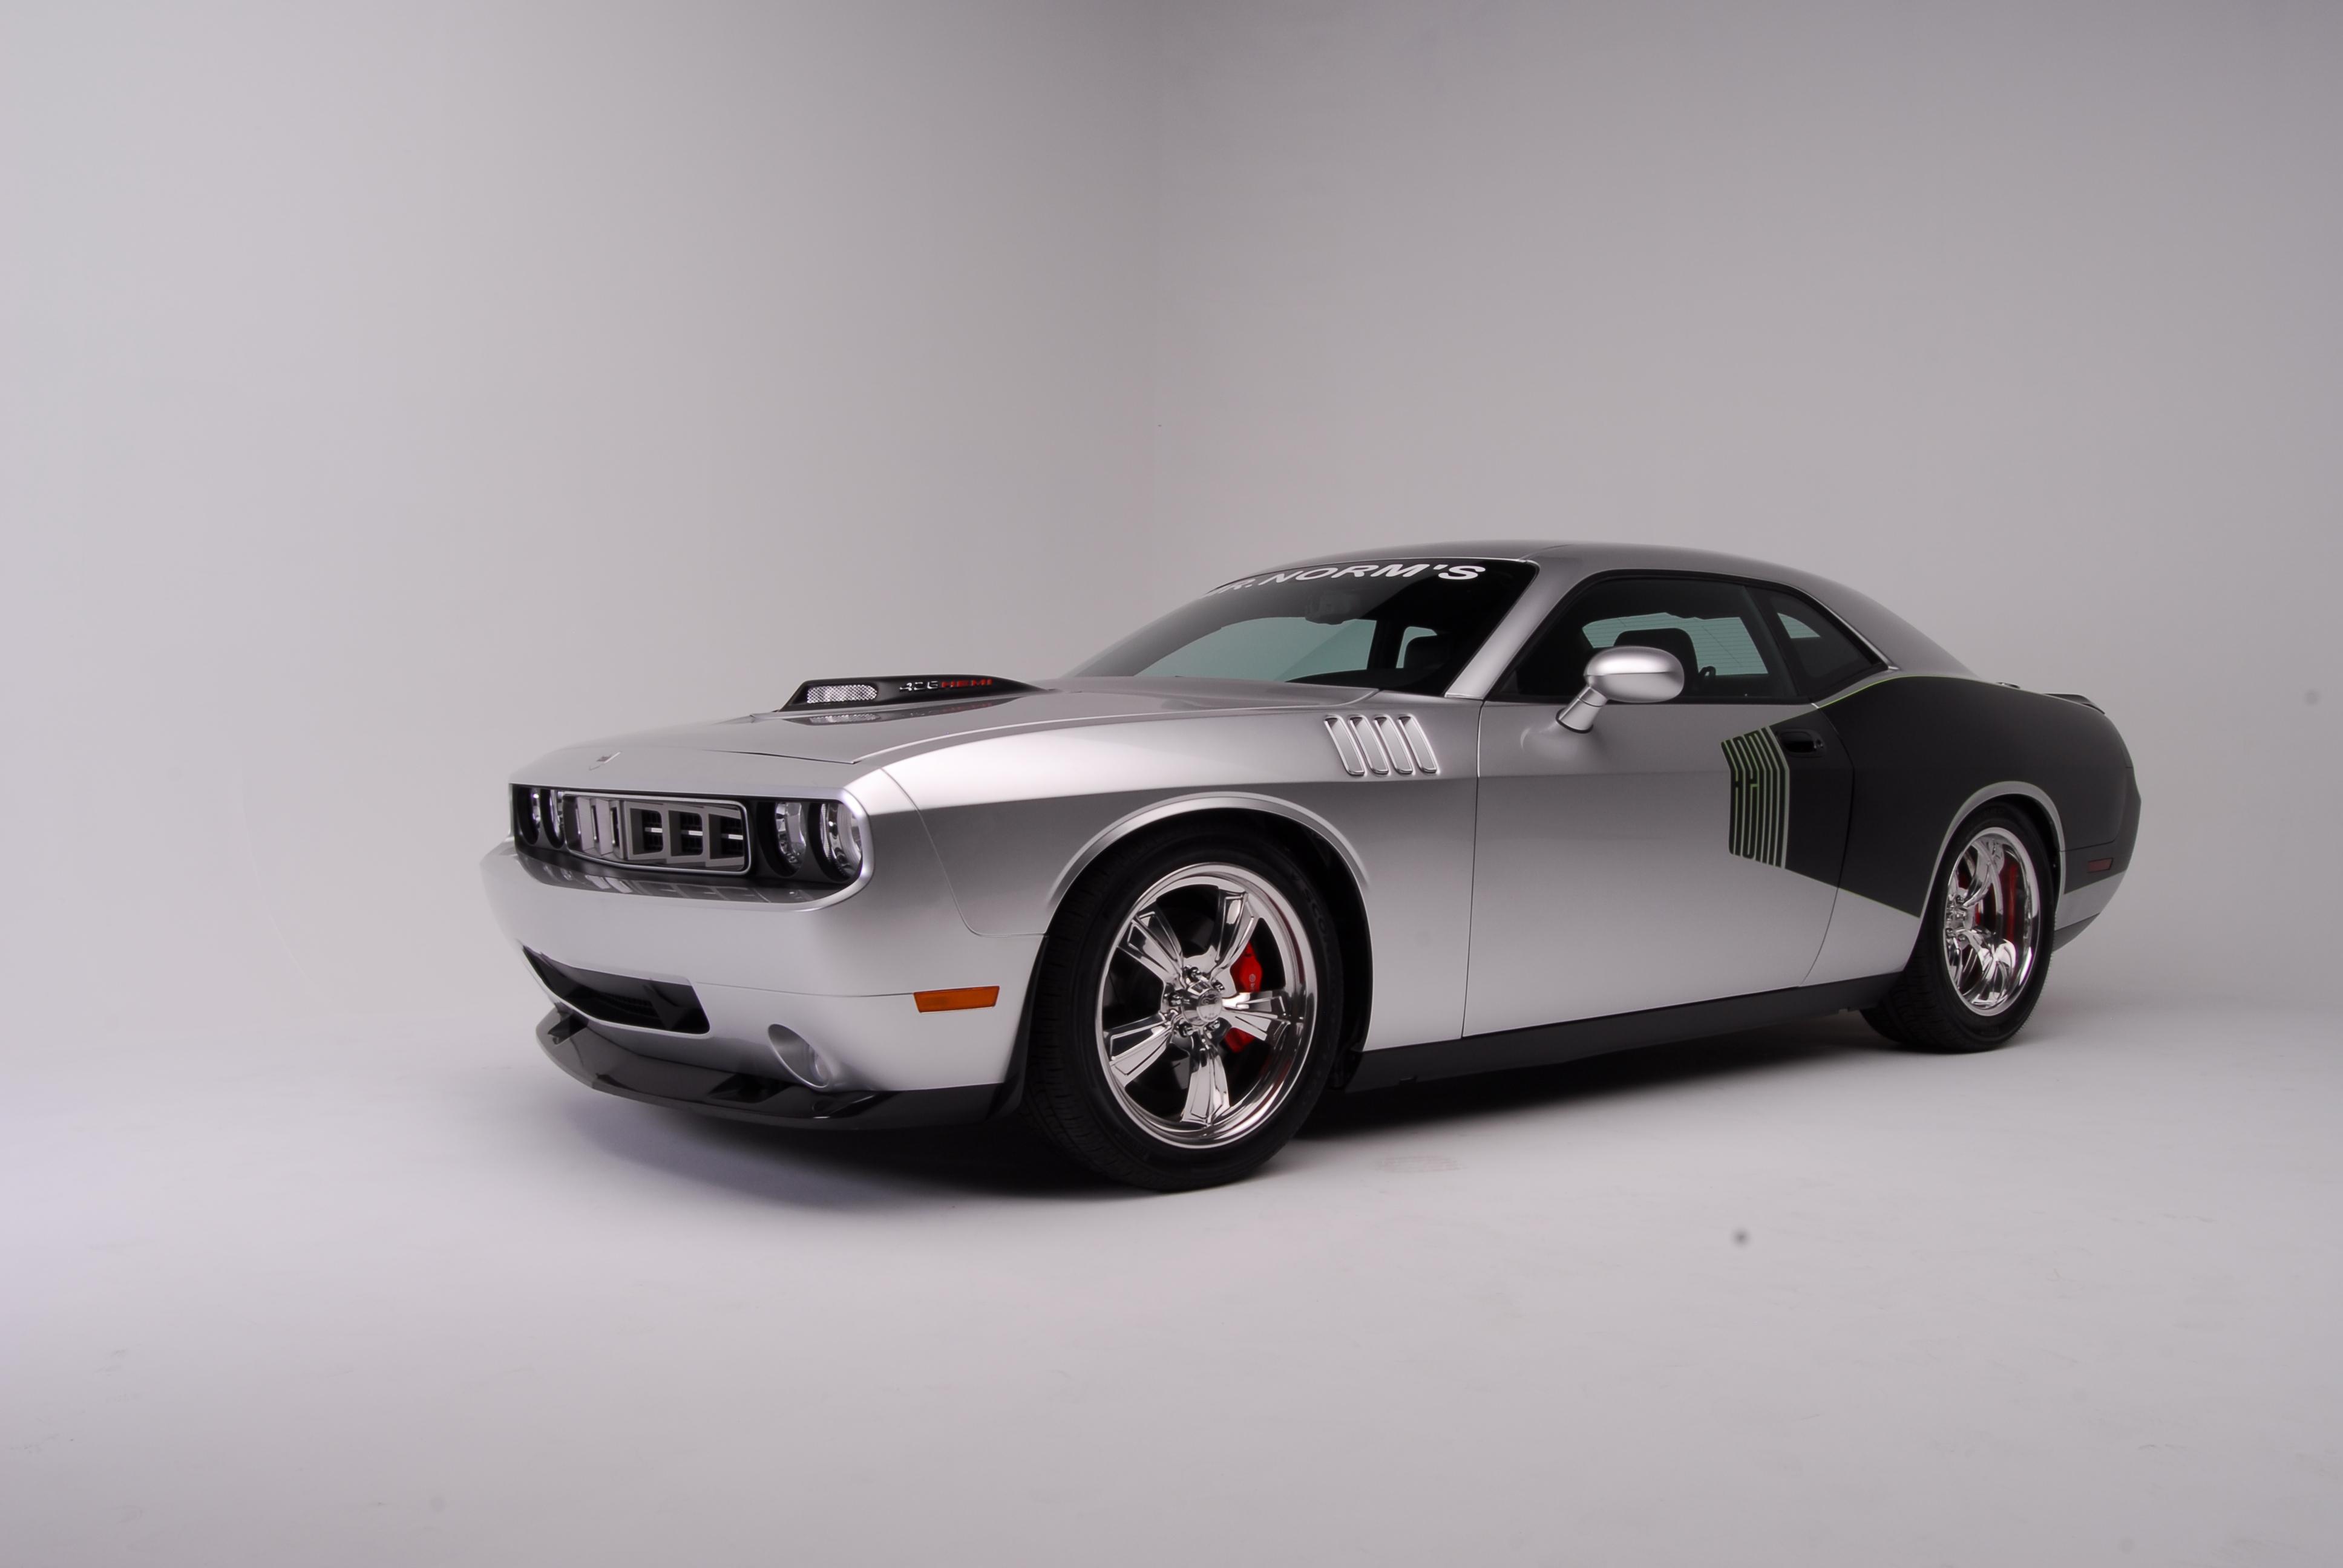 2009 Dodge Challenger SRT/8